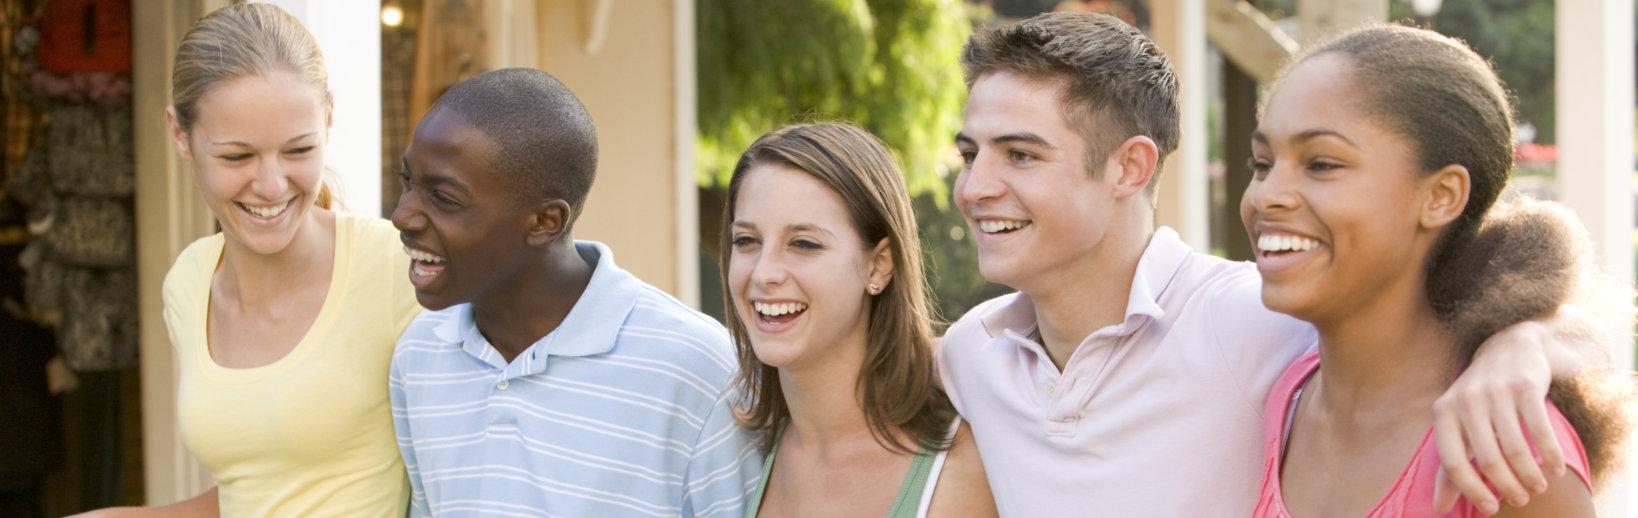 Multi racial teenagers